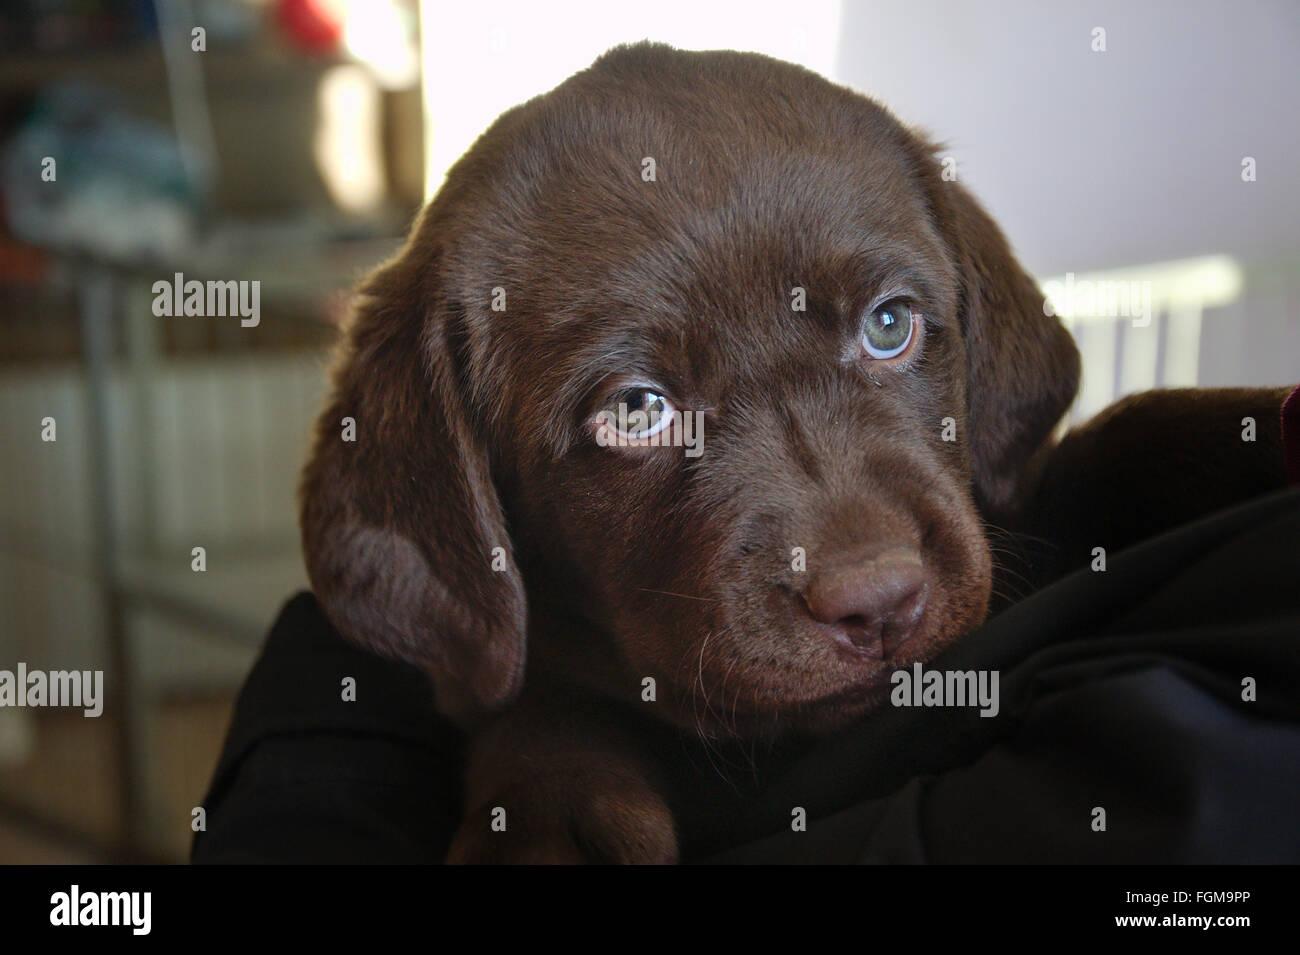 a brown cute Labrador Puppy - Stock Image